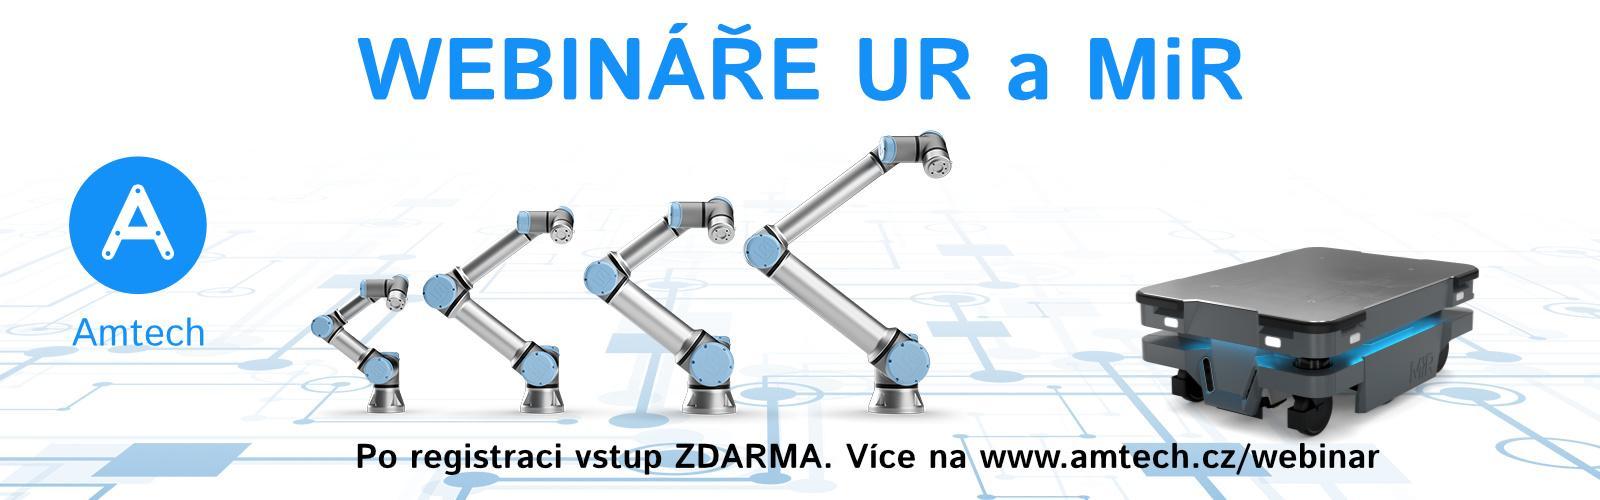 Webináře robotika - amtech.cz